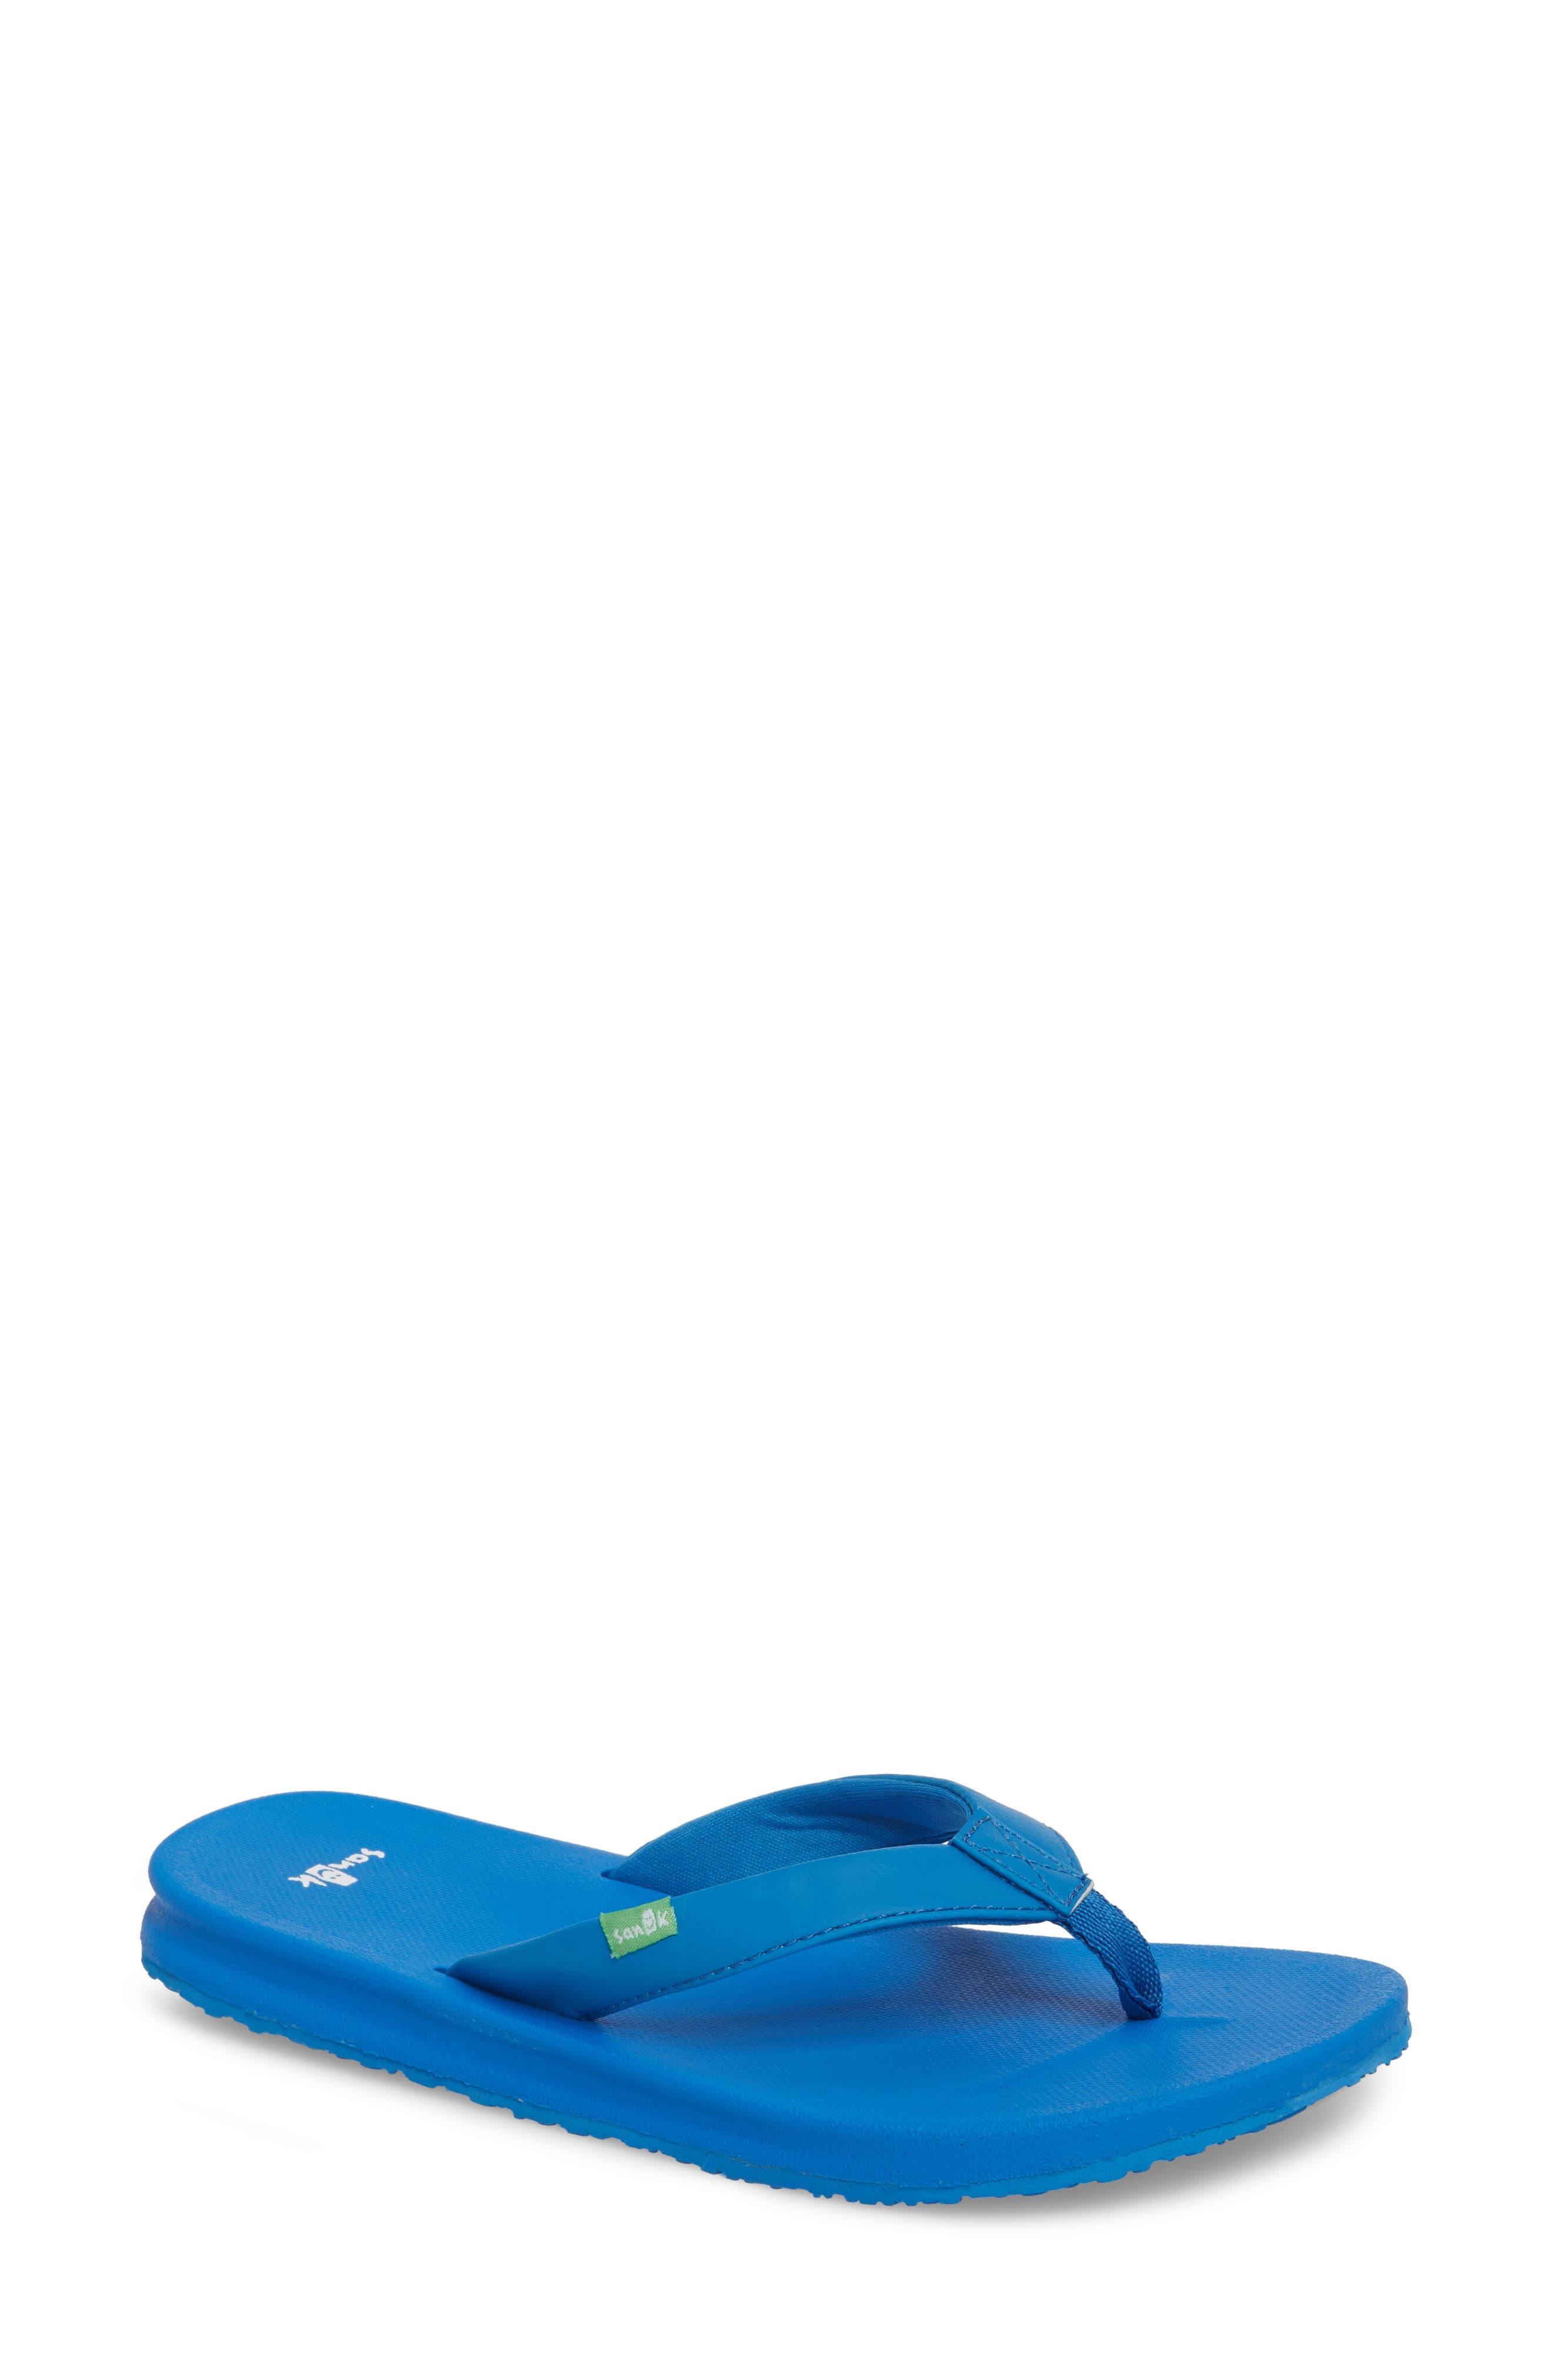 'Yoga Sling 2' Sandal,                             Main thumbnail 1, color,                             434